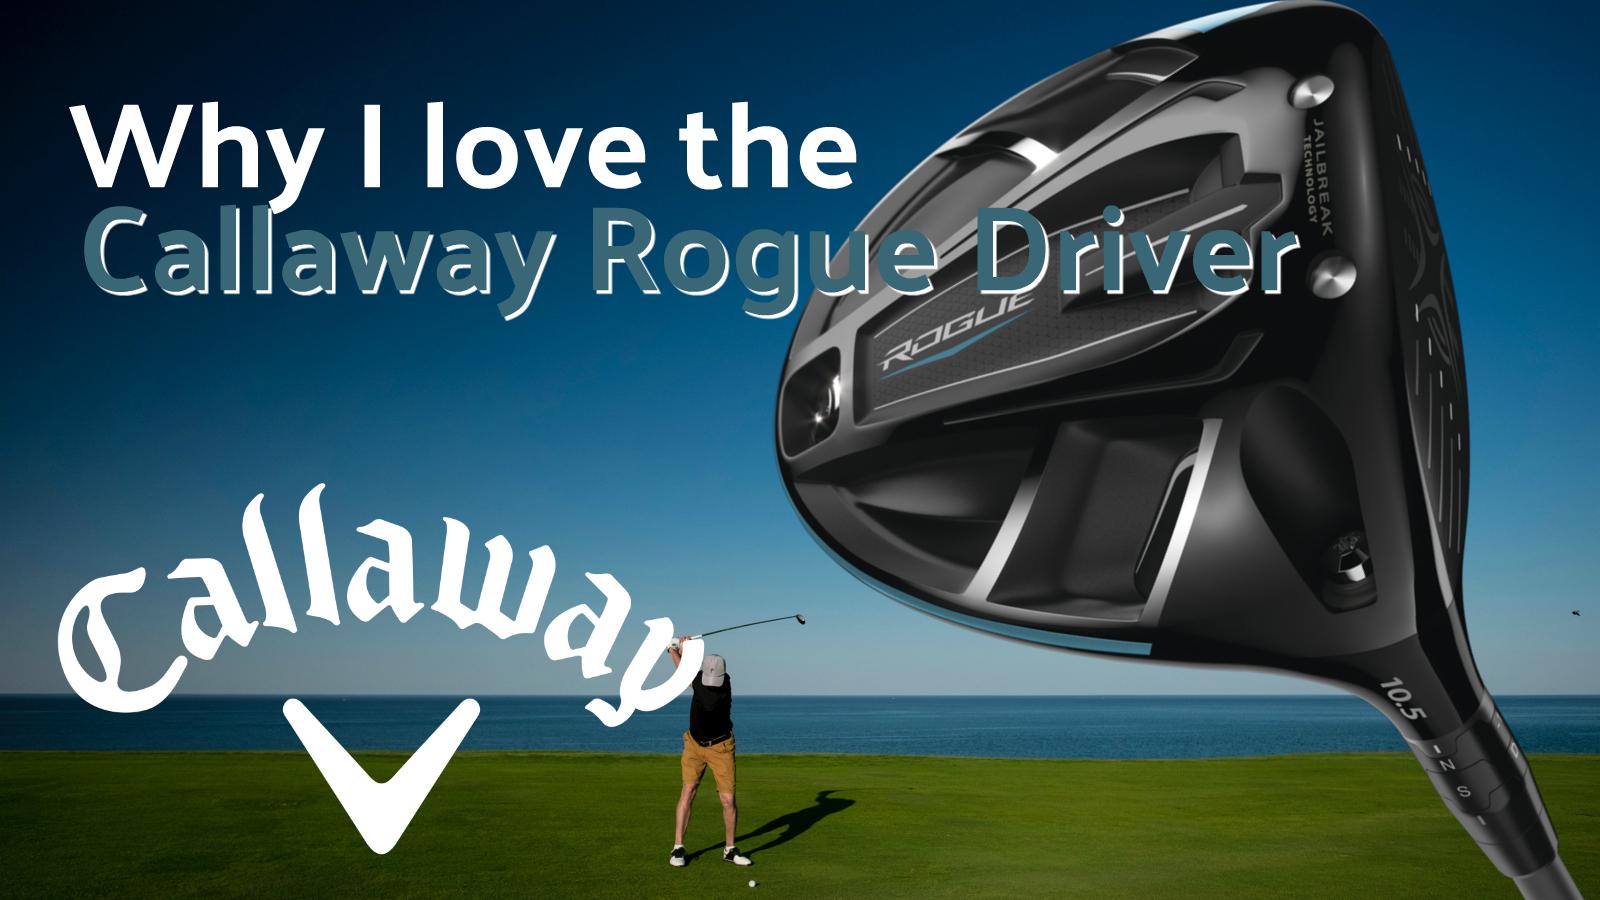 Why We Love The Callaway Rogue Driver   2018 Callaway Rogue